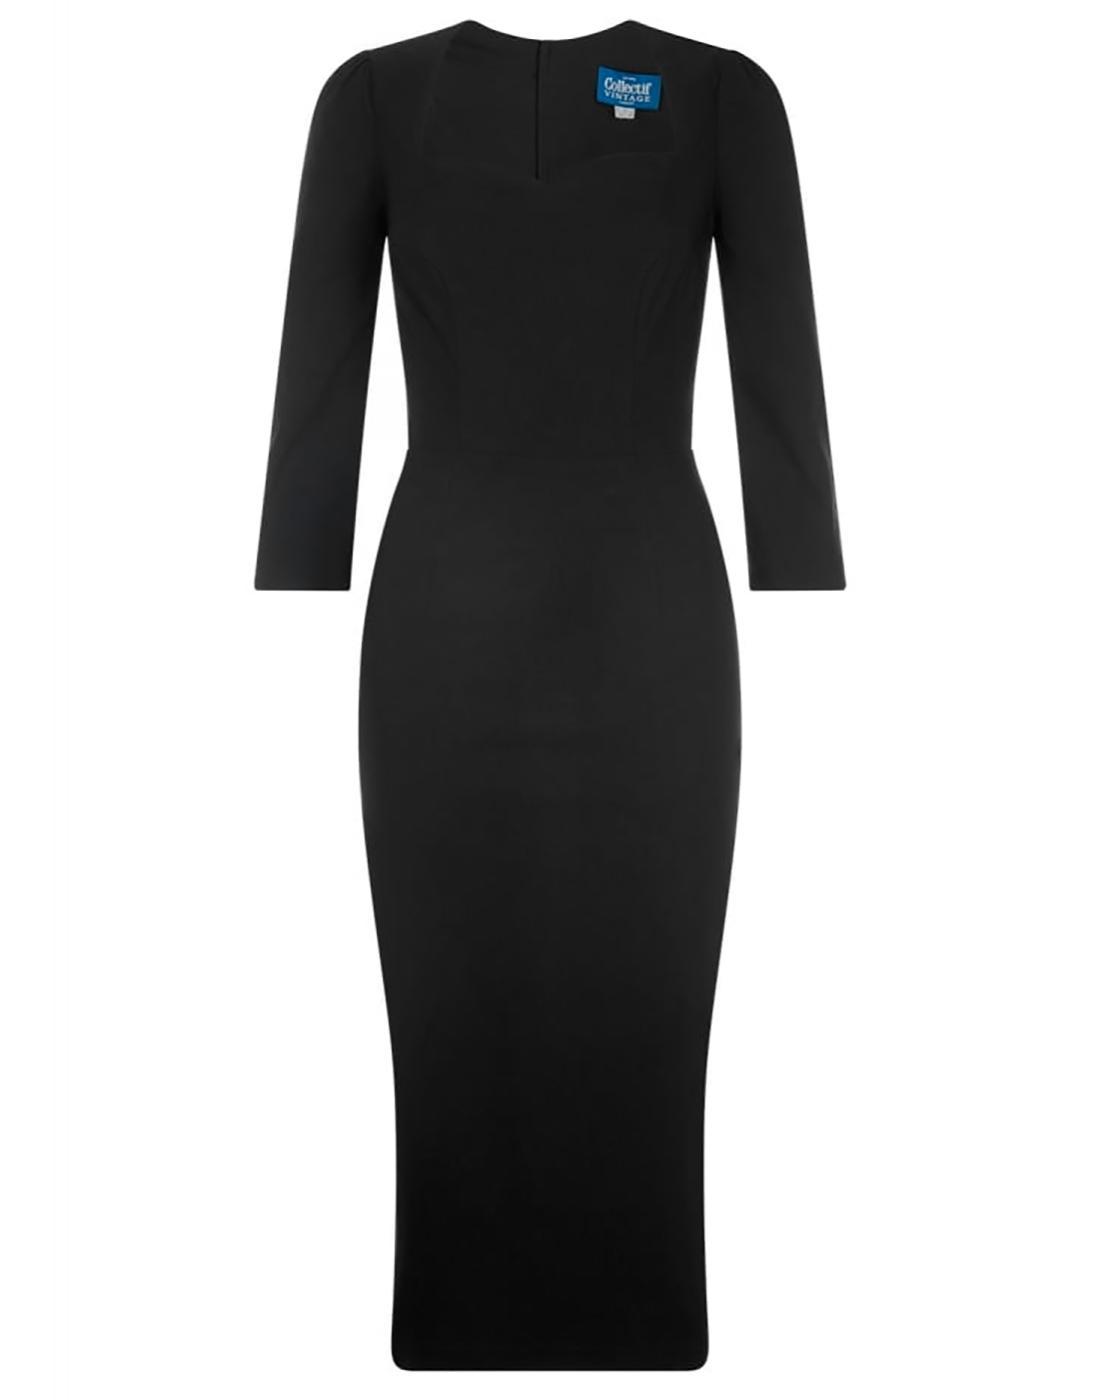 Vanessa COLLECTIF Retro 50s Pencil Dress in Black